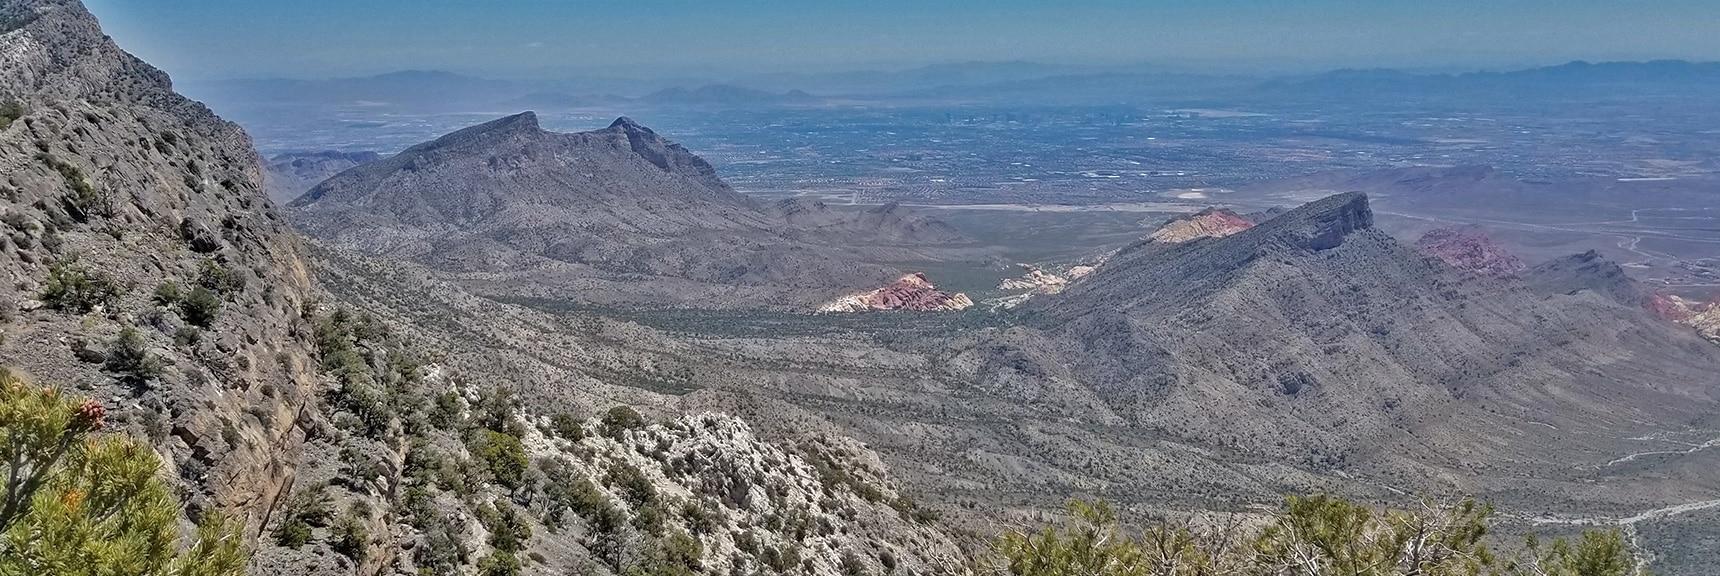 La Madre Mountain Western Approach | La Madre Mountains Wilderness, Nevada